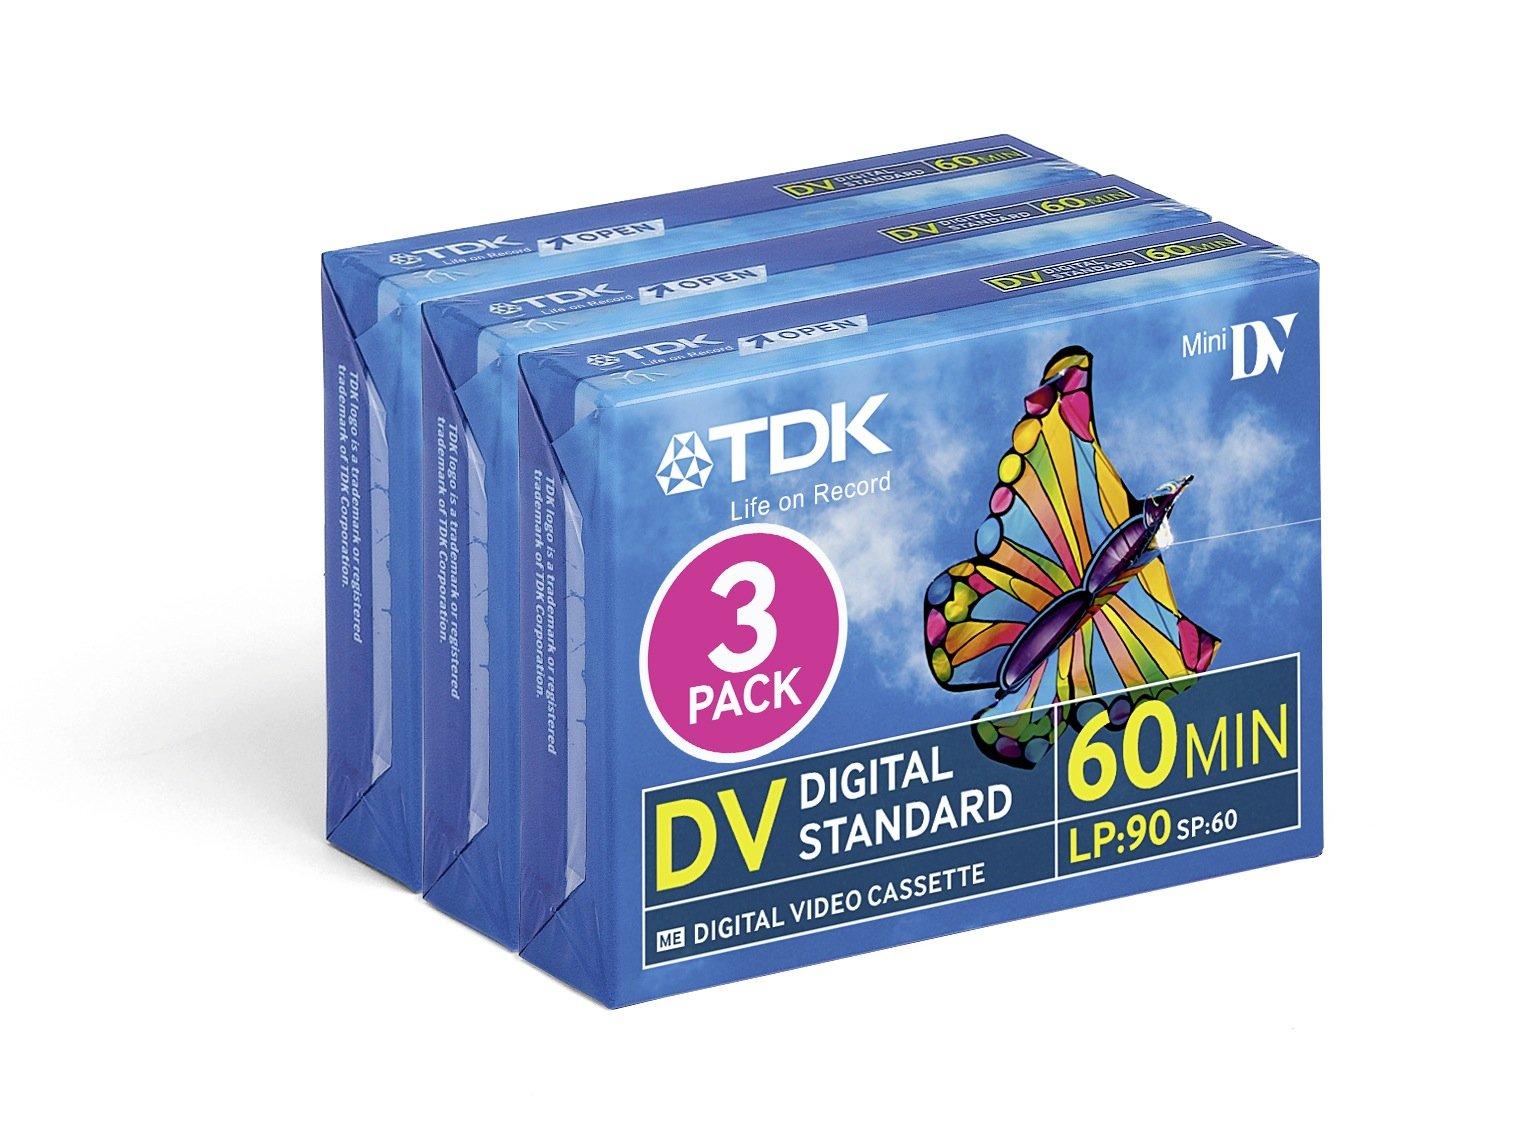 TDK DVM60 60 Minute LP:90 Blank Tapes Cassettes for Mini DV Camcorders - 3 Pack